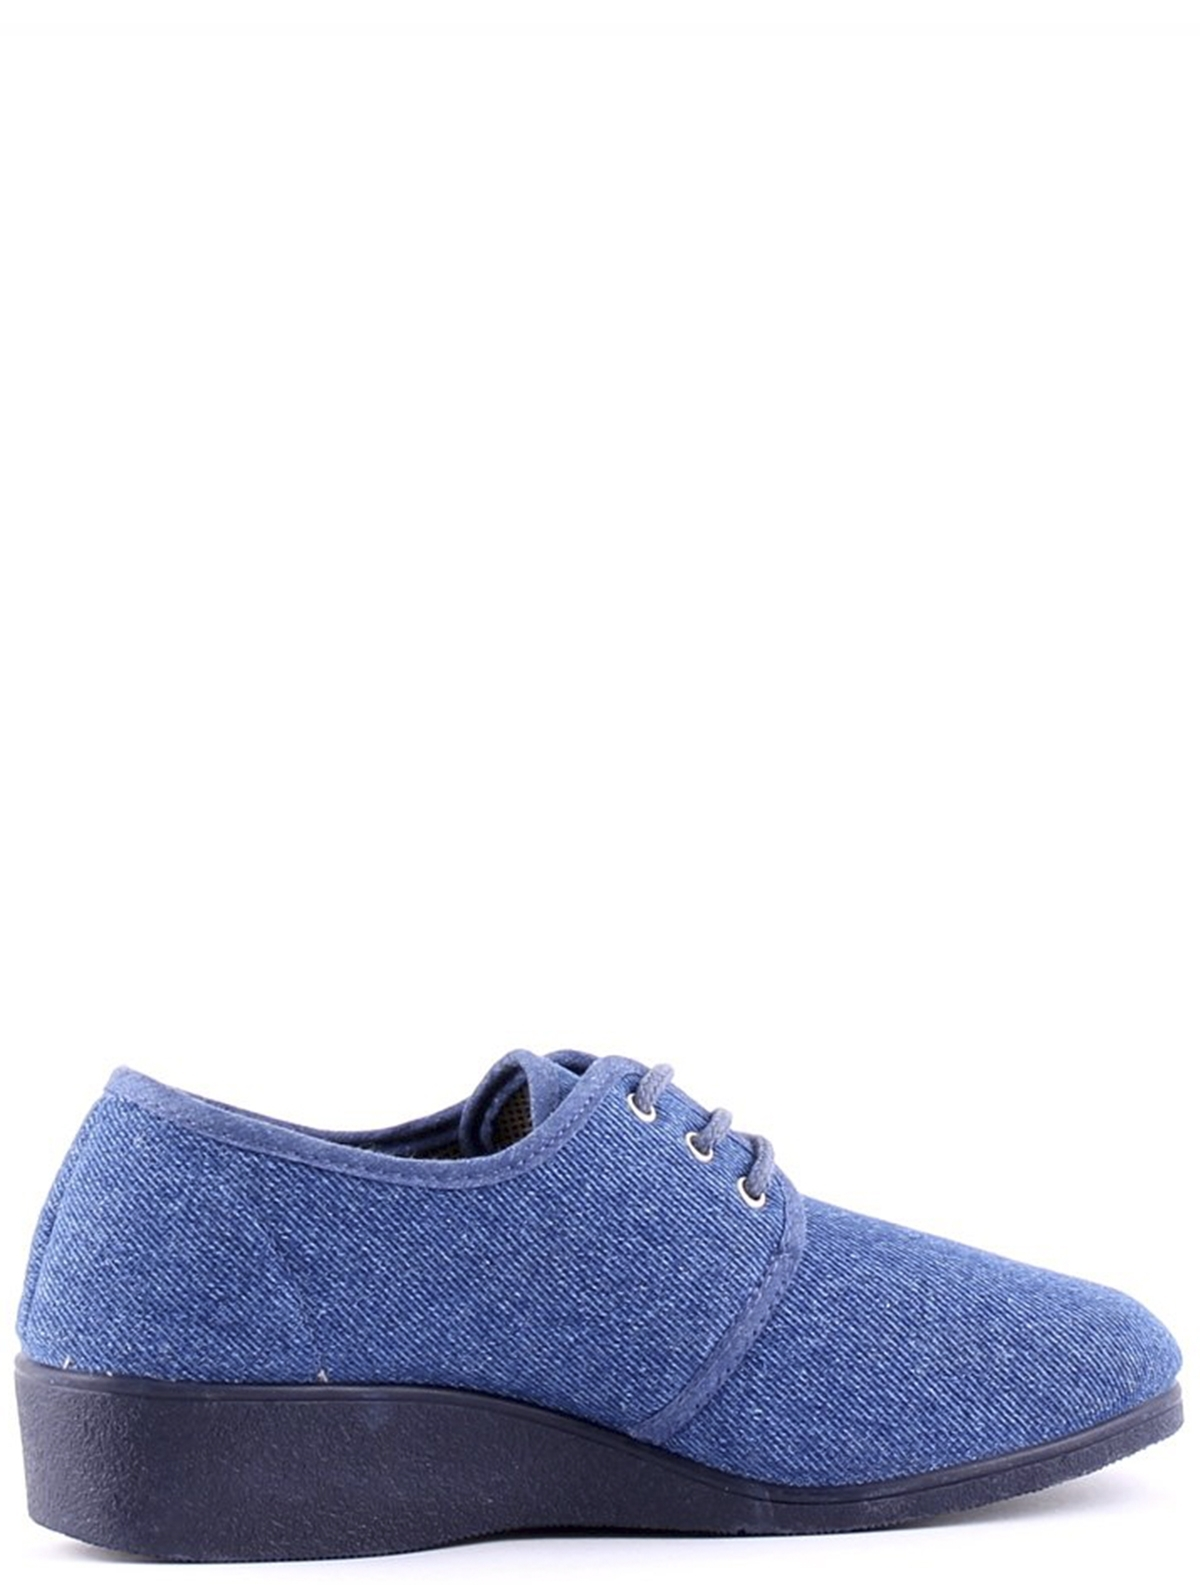 Imara Moda 183-19008-805 женские туфли